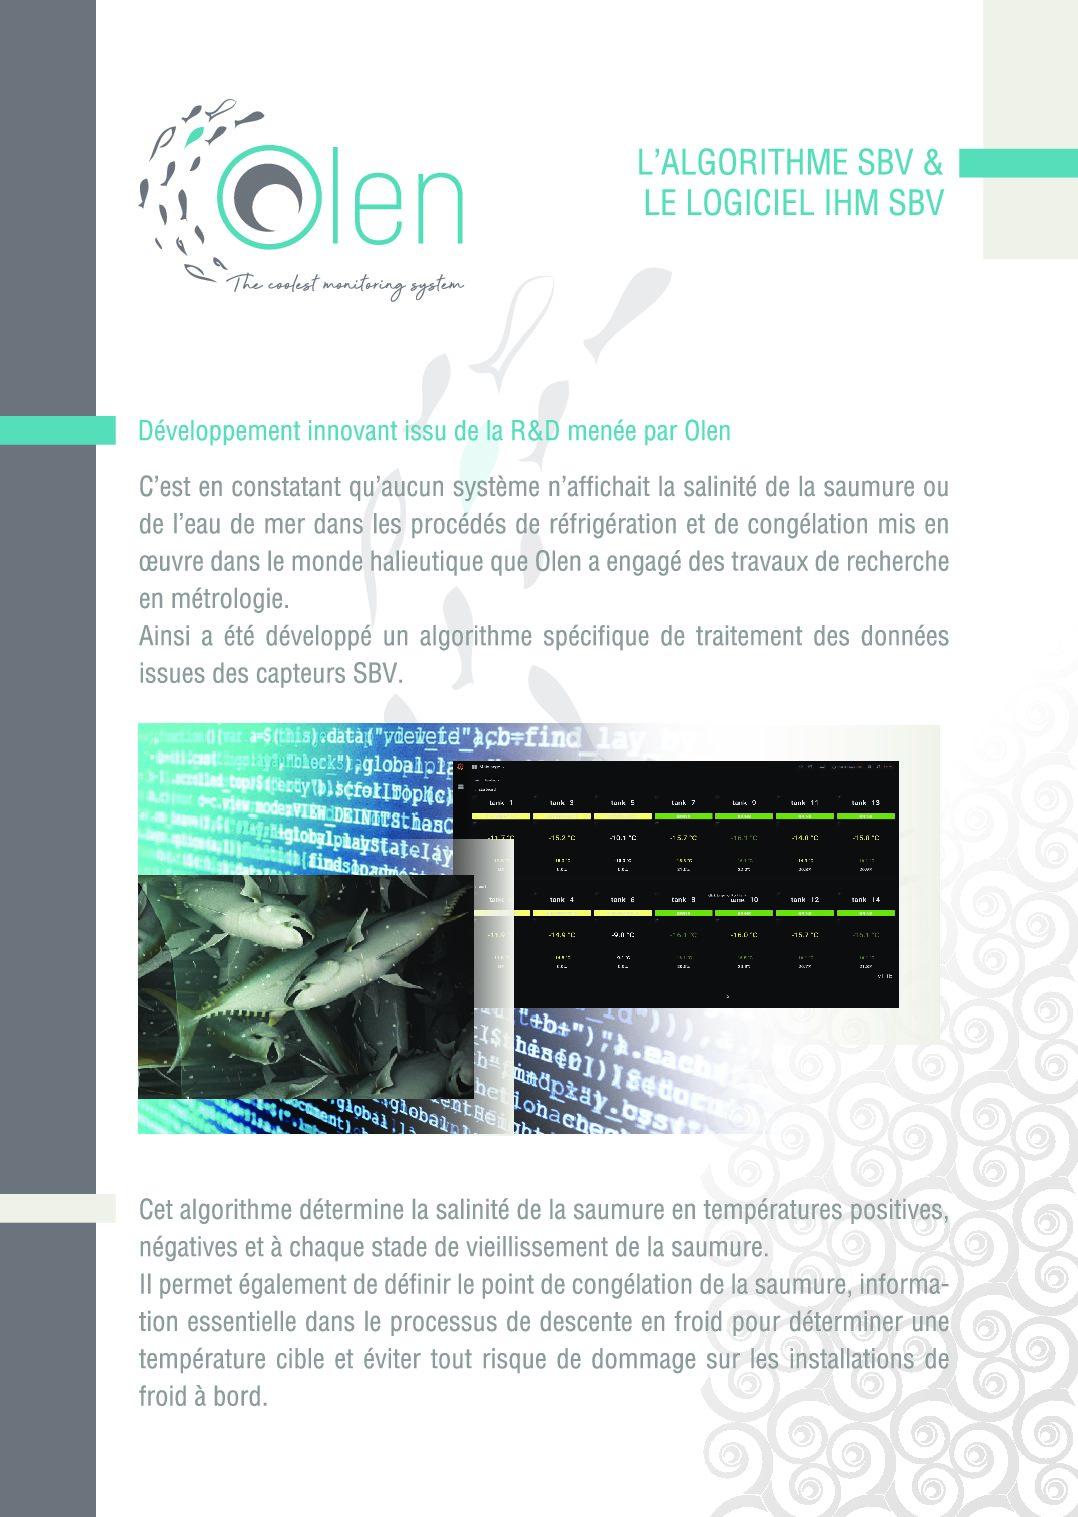 LALGORITHME SBV LE LOGICIEL IHM SBV FR pdf - Produits